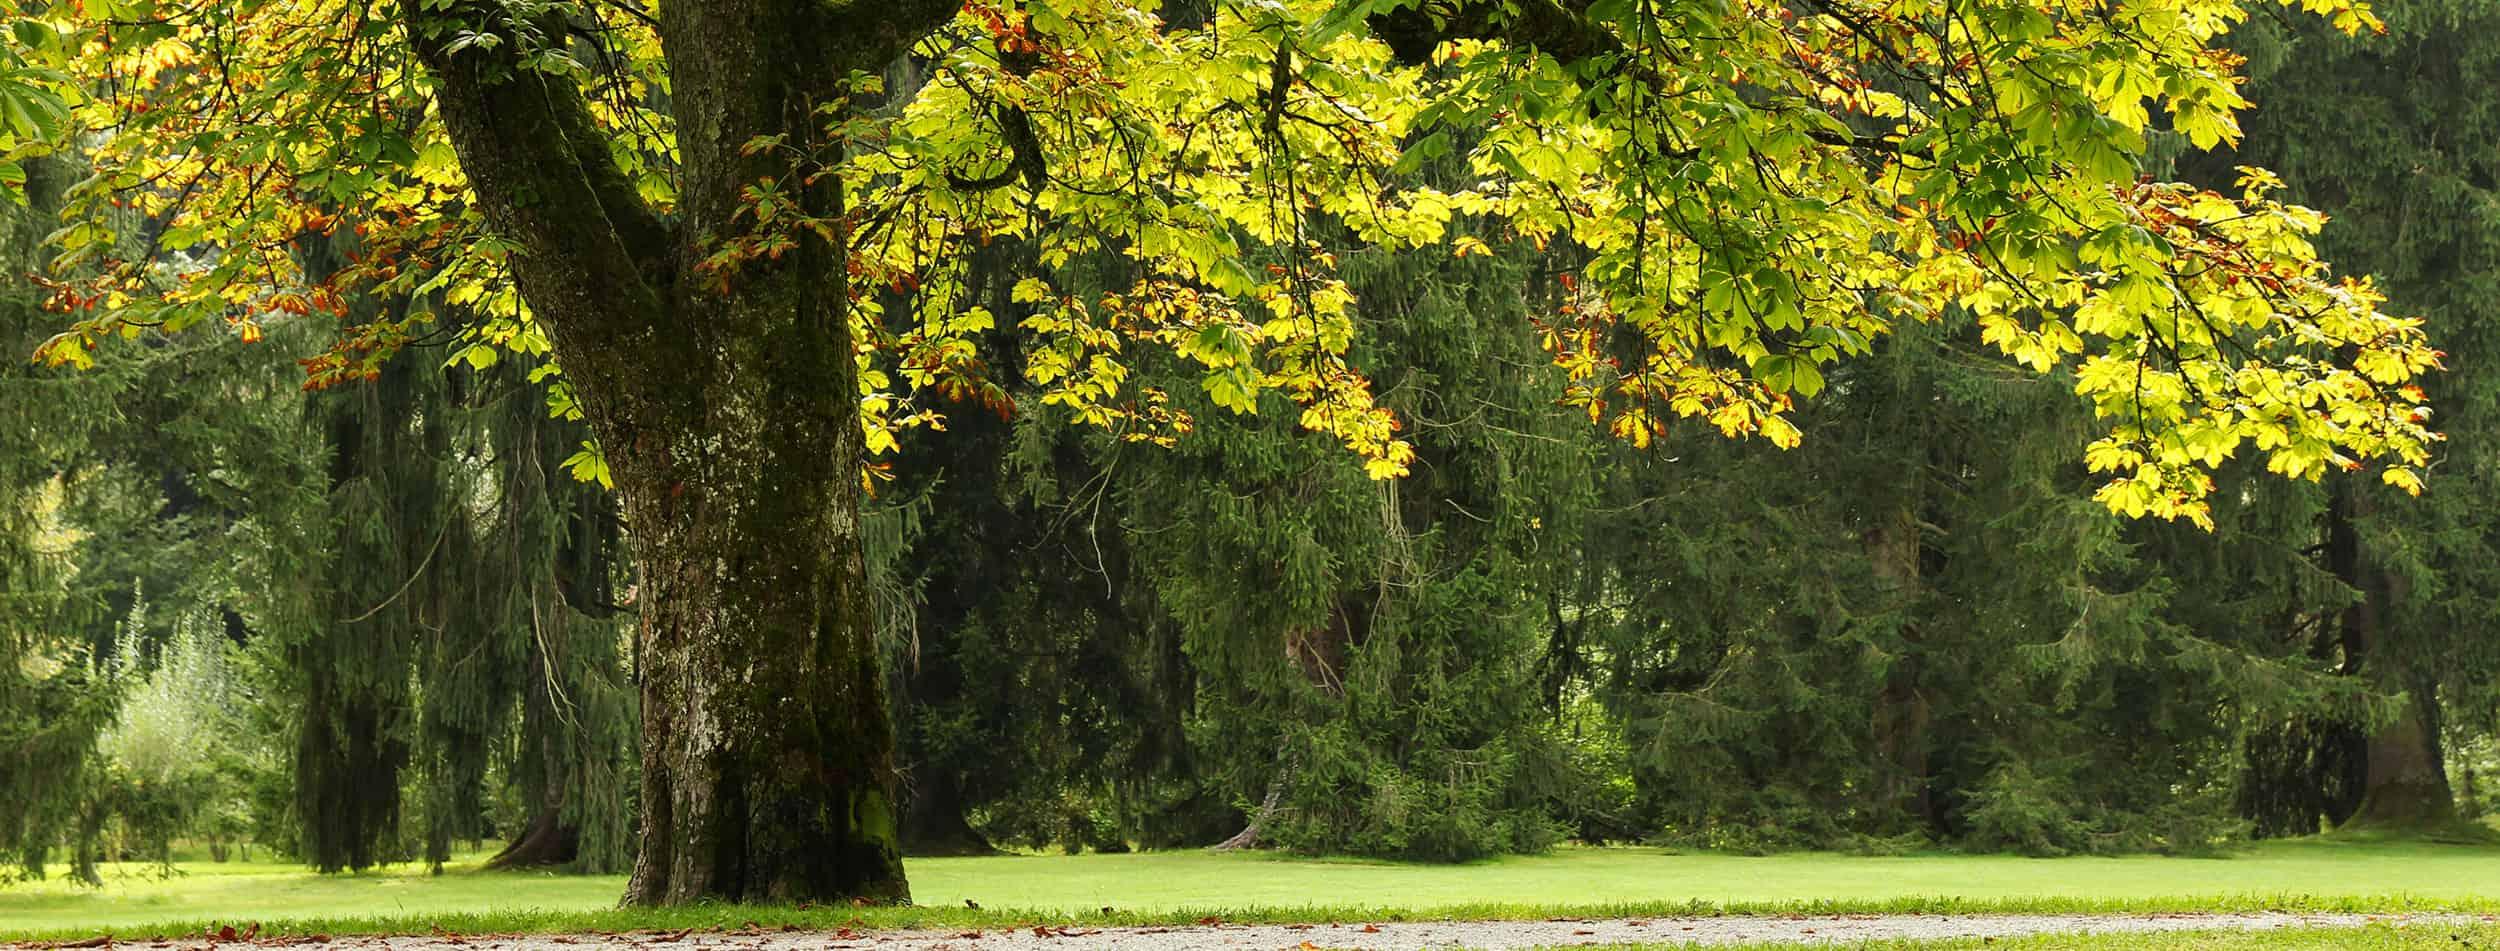 Baum pflegen Altbestand